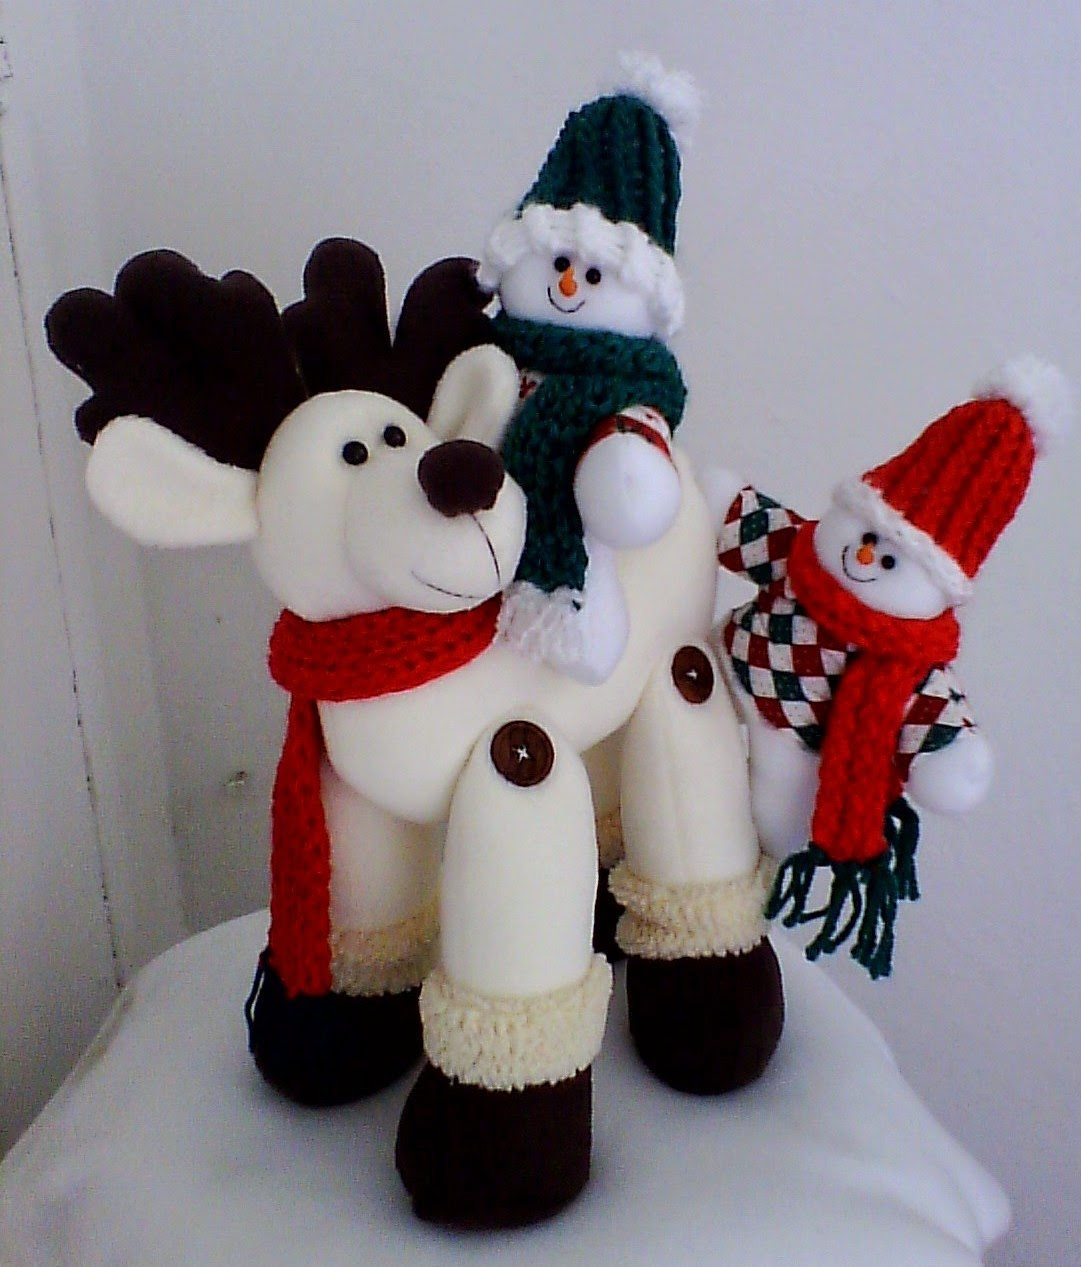 Mu ecos navide os patrones de mu ecos navide os - Manualidades munecos de navidad ...